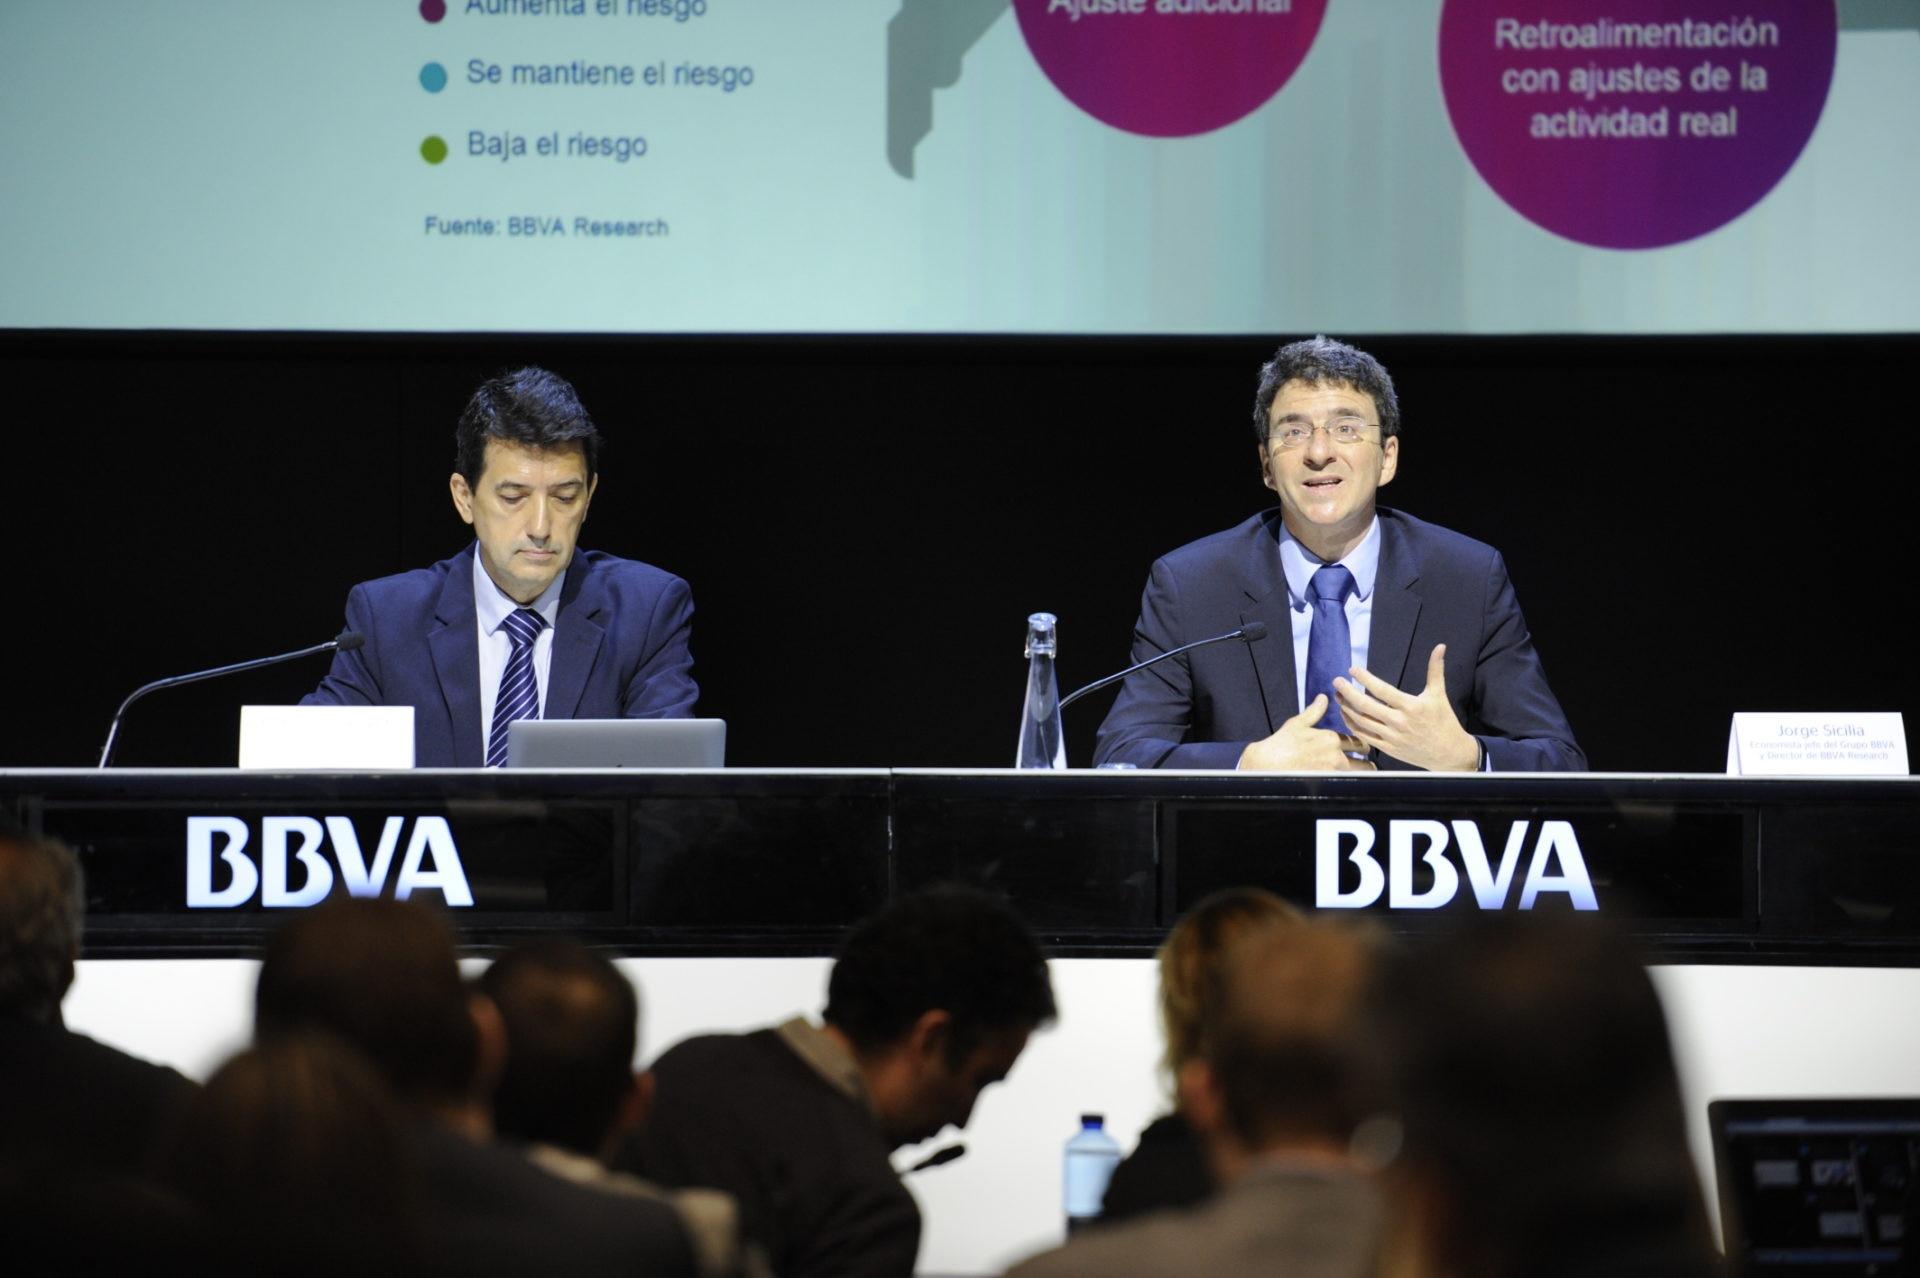 Jorge Sicilia, economista jefe del Grupo BBVA, y Rafael Doménech, economista jefe de Economías Desarrolladas de BBVA Research